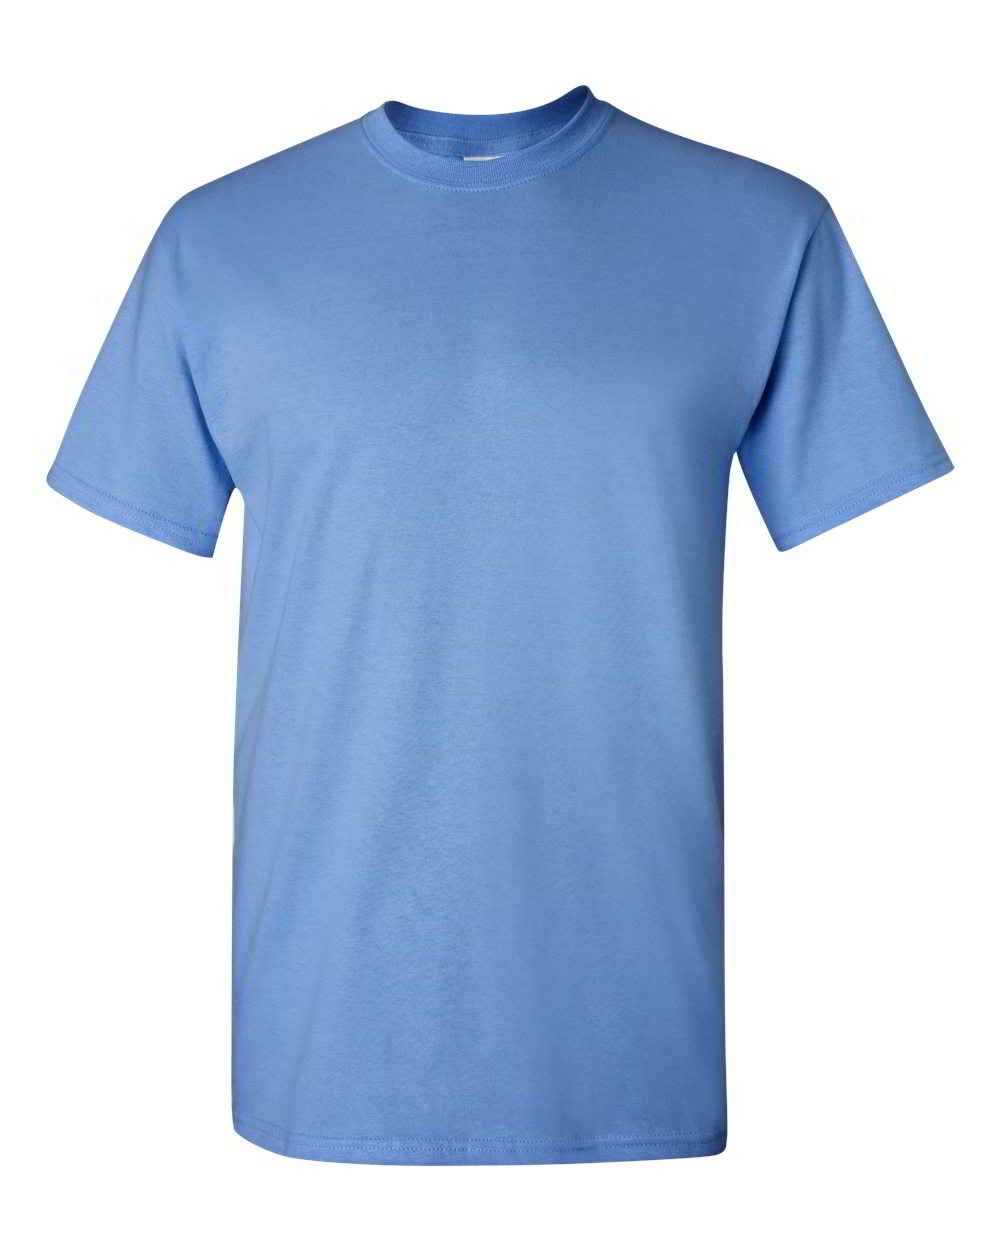 Gildan-Heavy-Cotton-Short-Sleeve-Mens-Blue-T-Shirts-5000 thumbnail 8